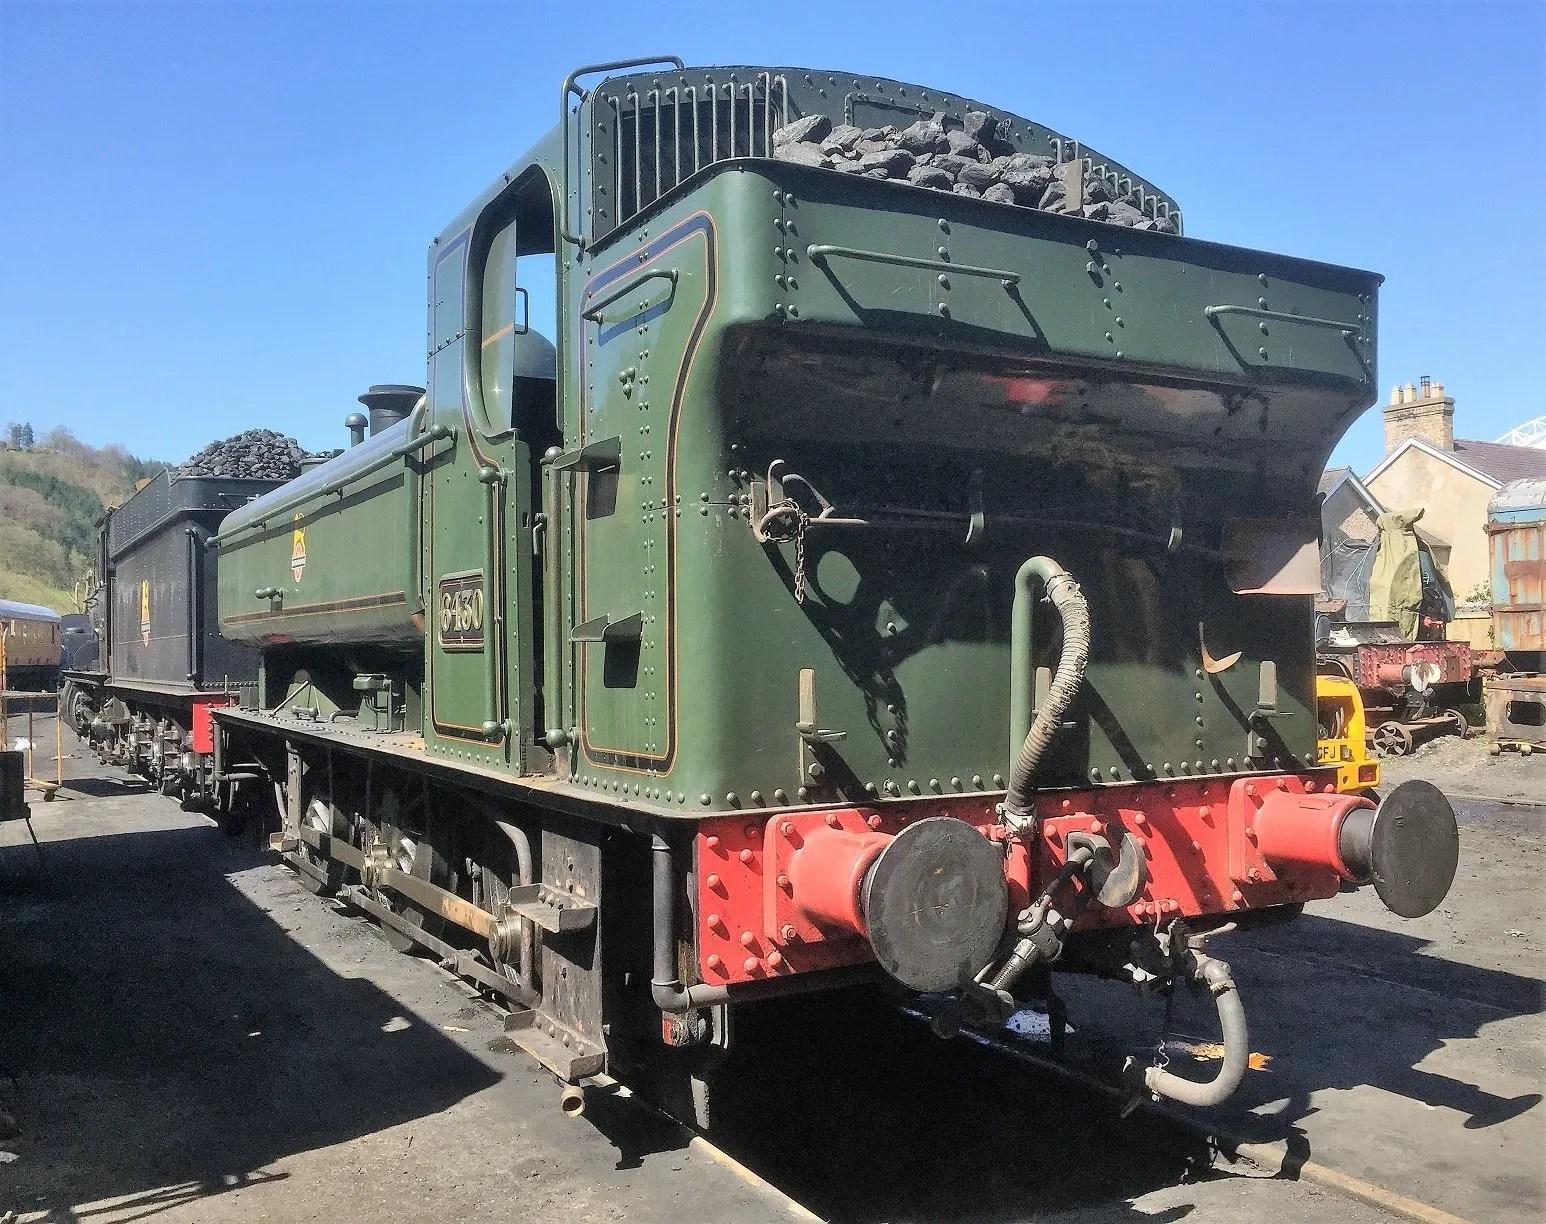 GWR Pannier Tank at Llangollen Railway